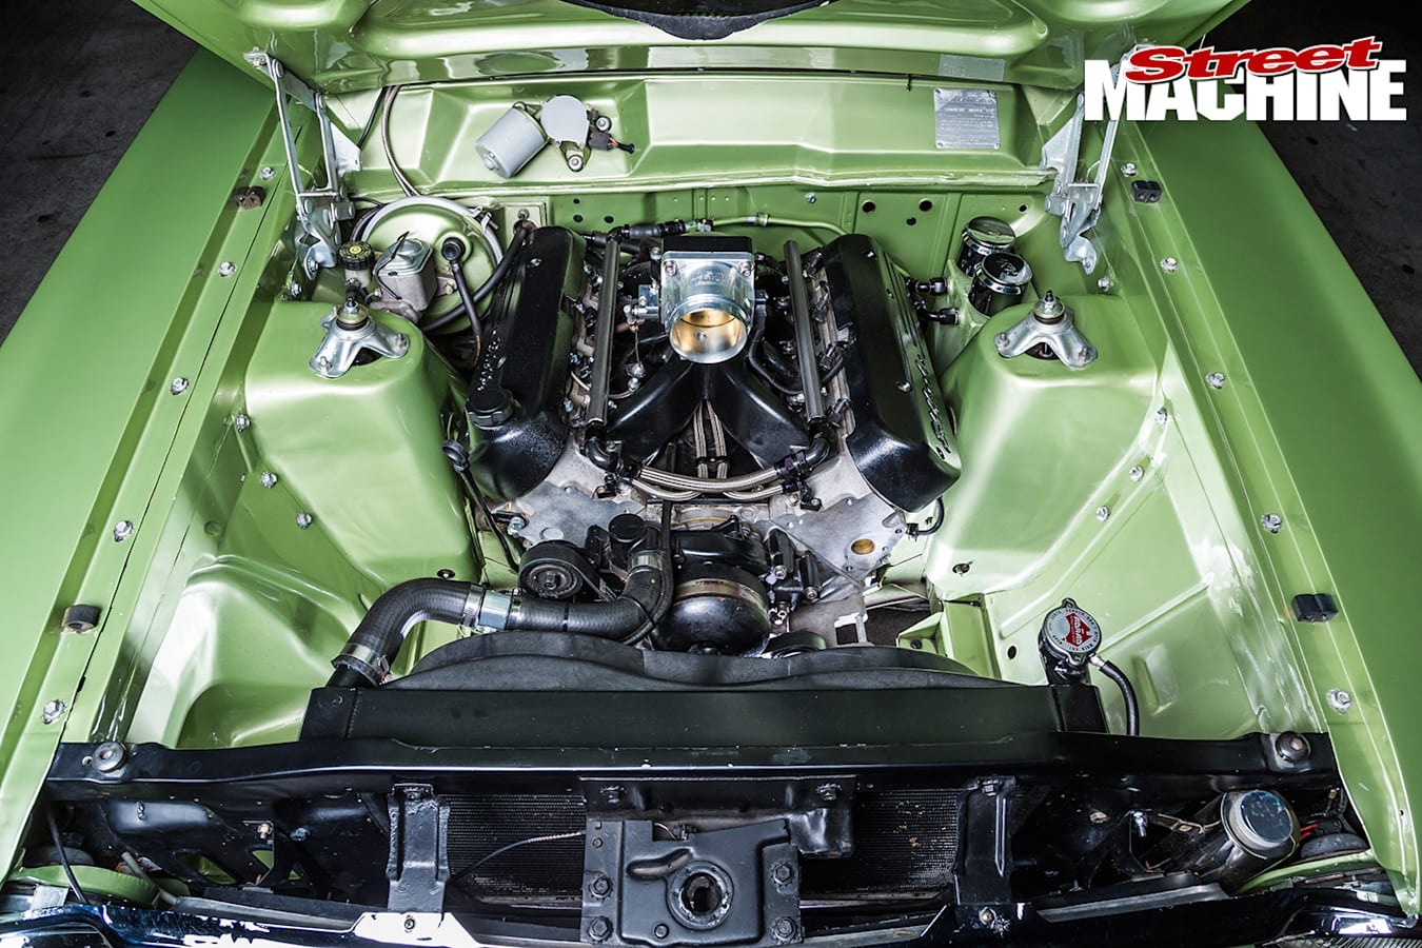 LS1-XW-Ford -Fairmont -GS-3-engine